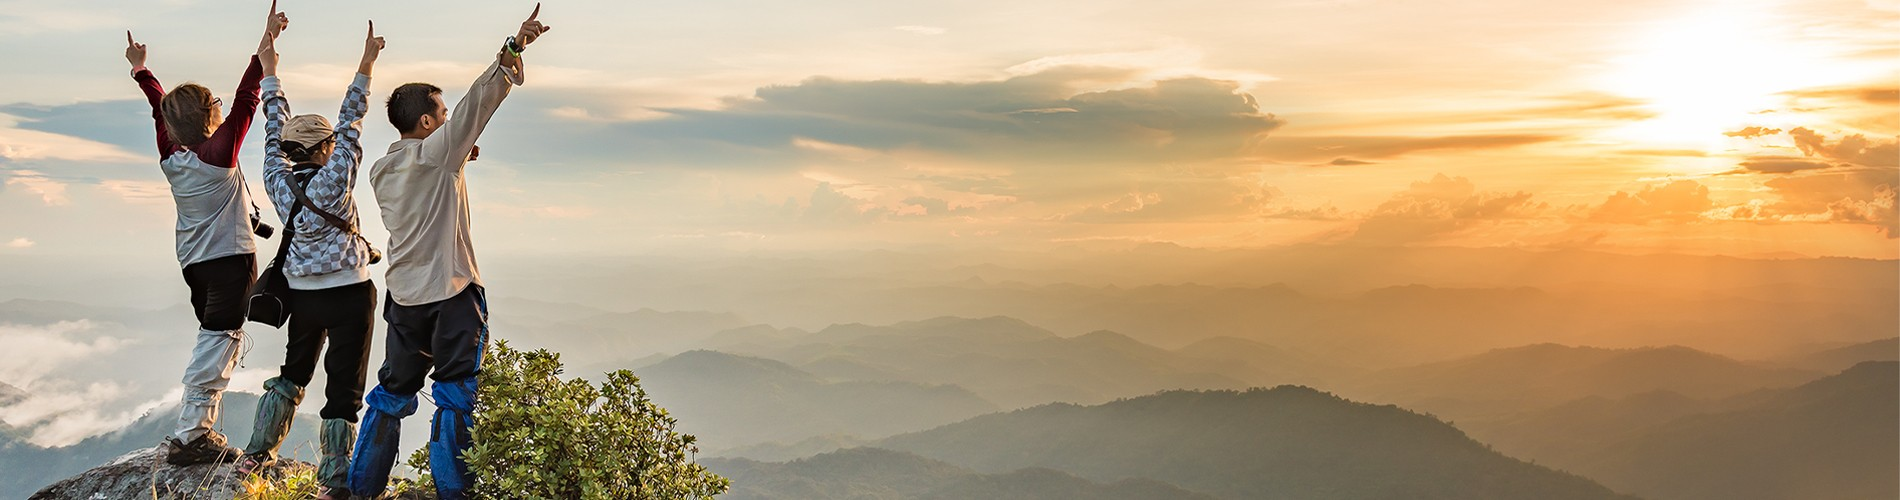 Sonnenuntergang Berge